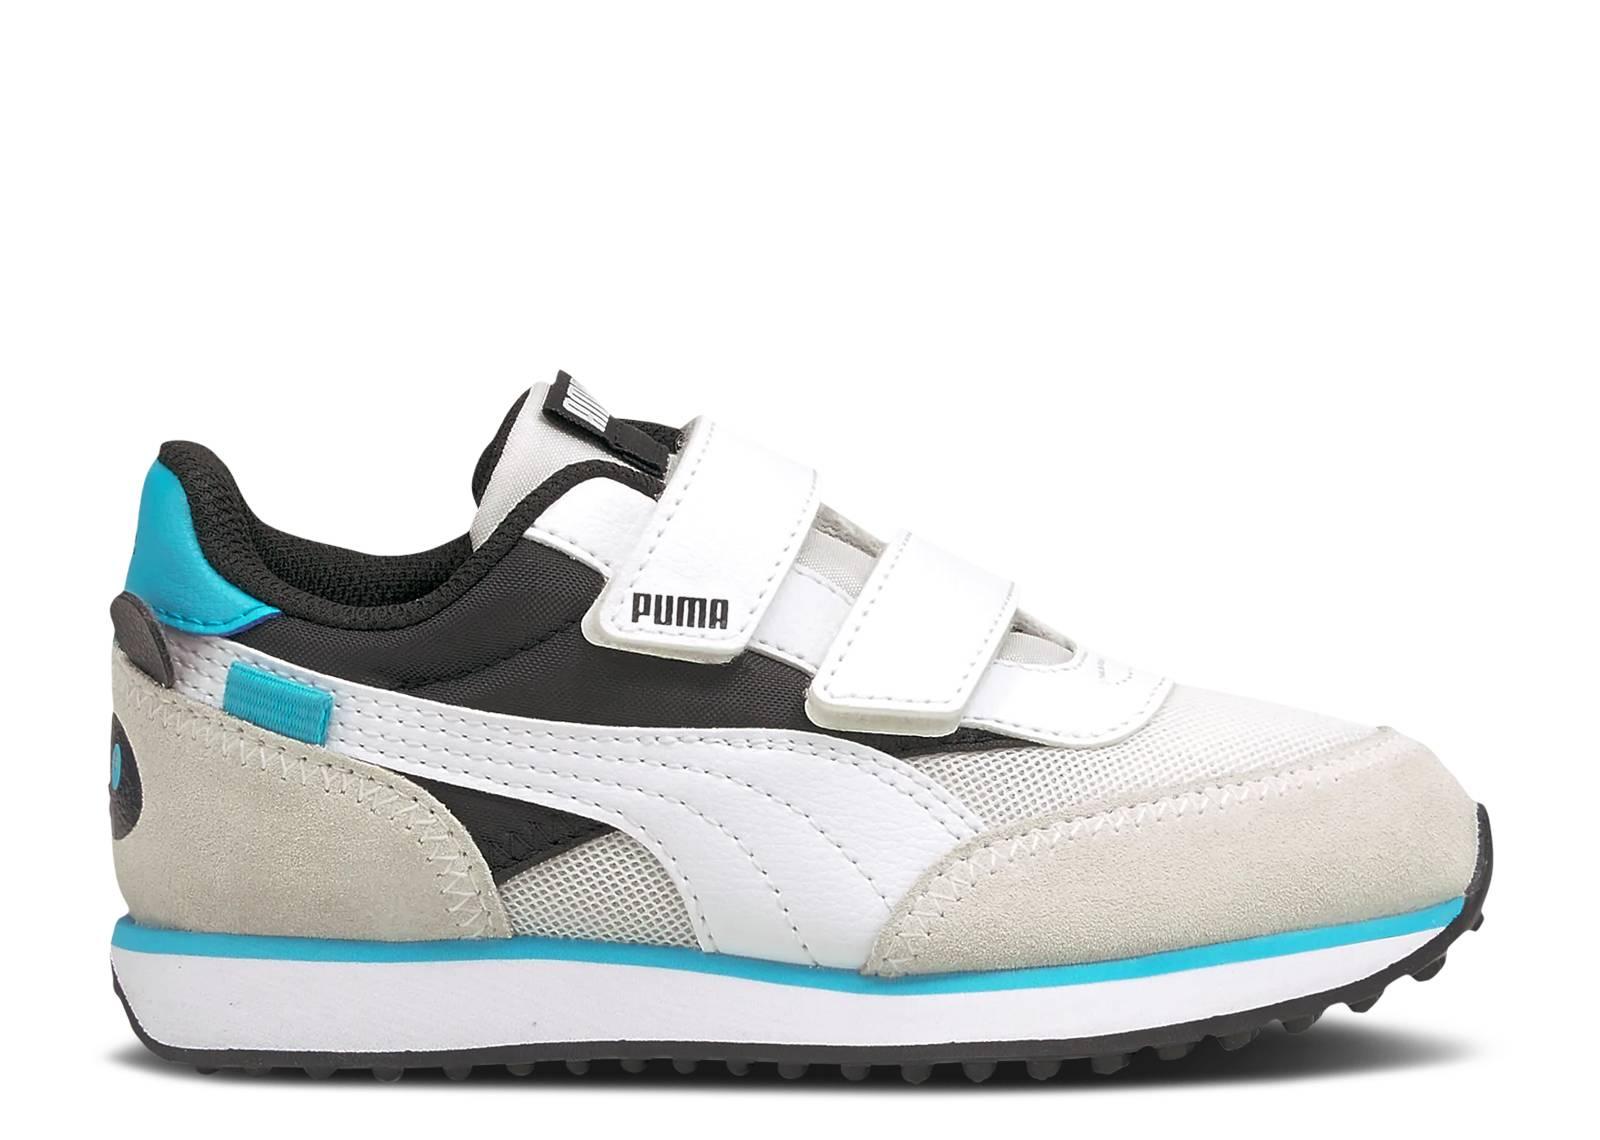 Future Rider Jr 'Animals Panda' - Puma - 368741 02 - black/white ...